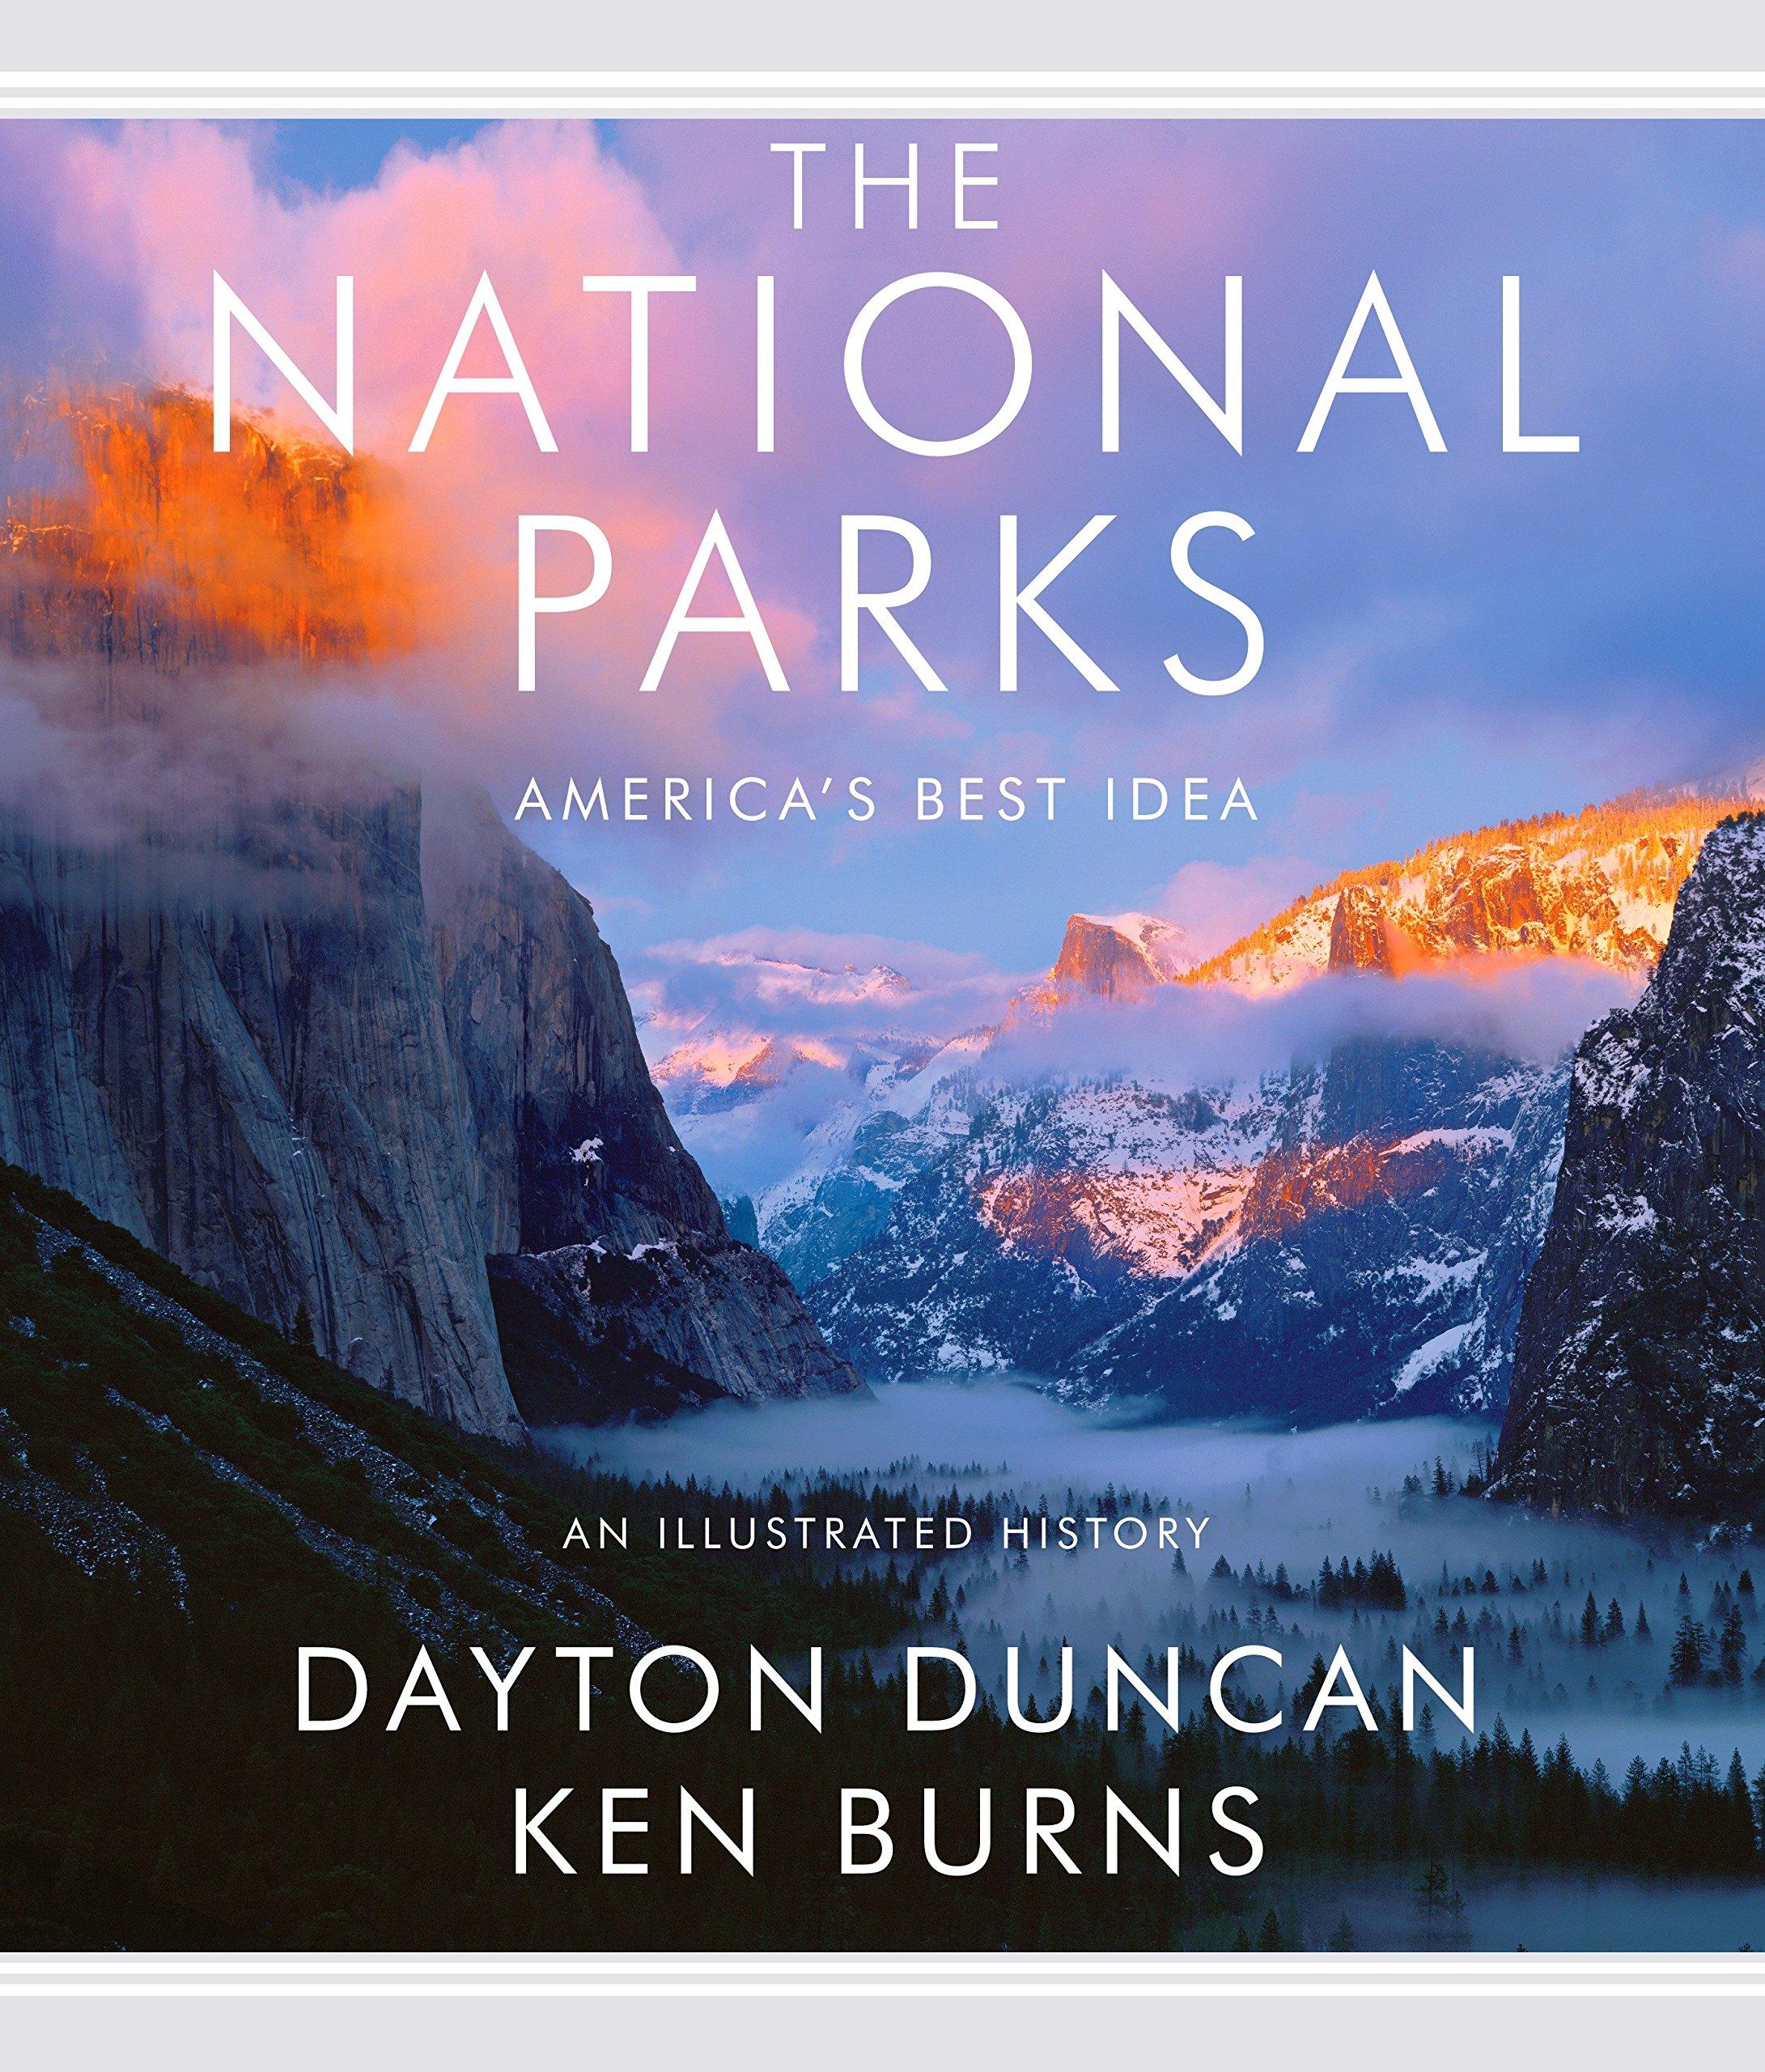 The National Parks: America's Best Idea by Random House